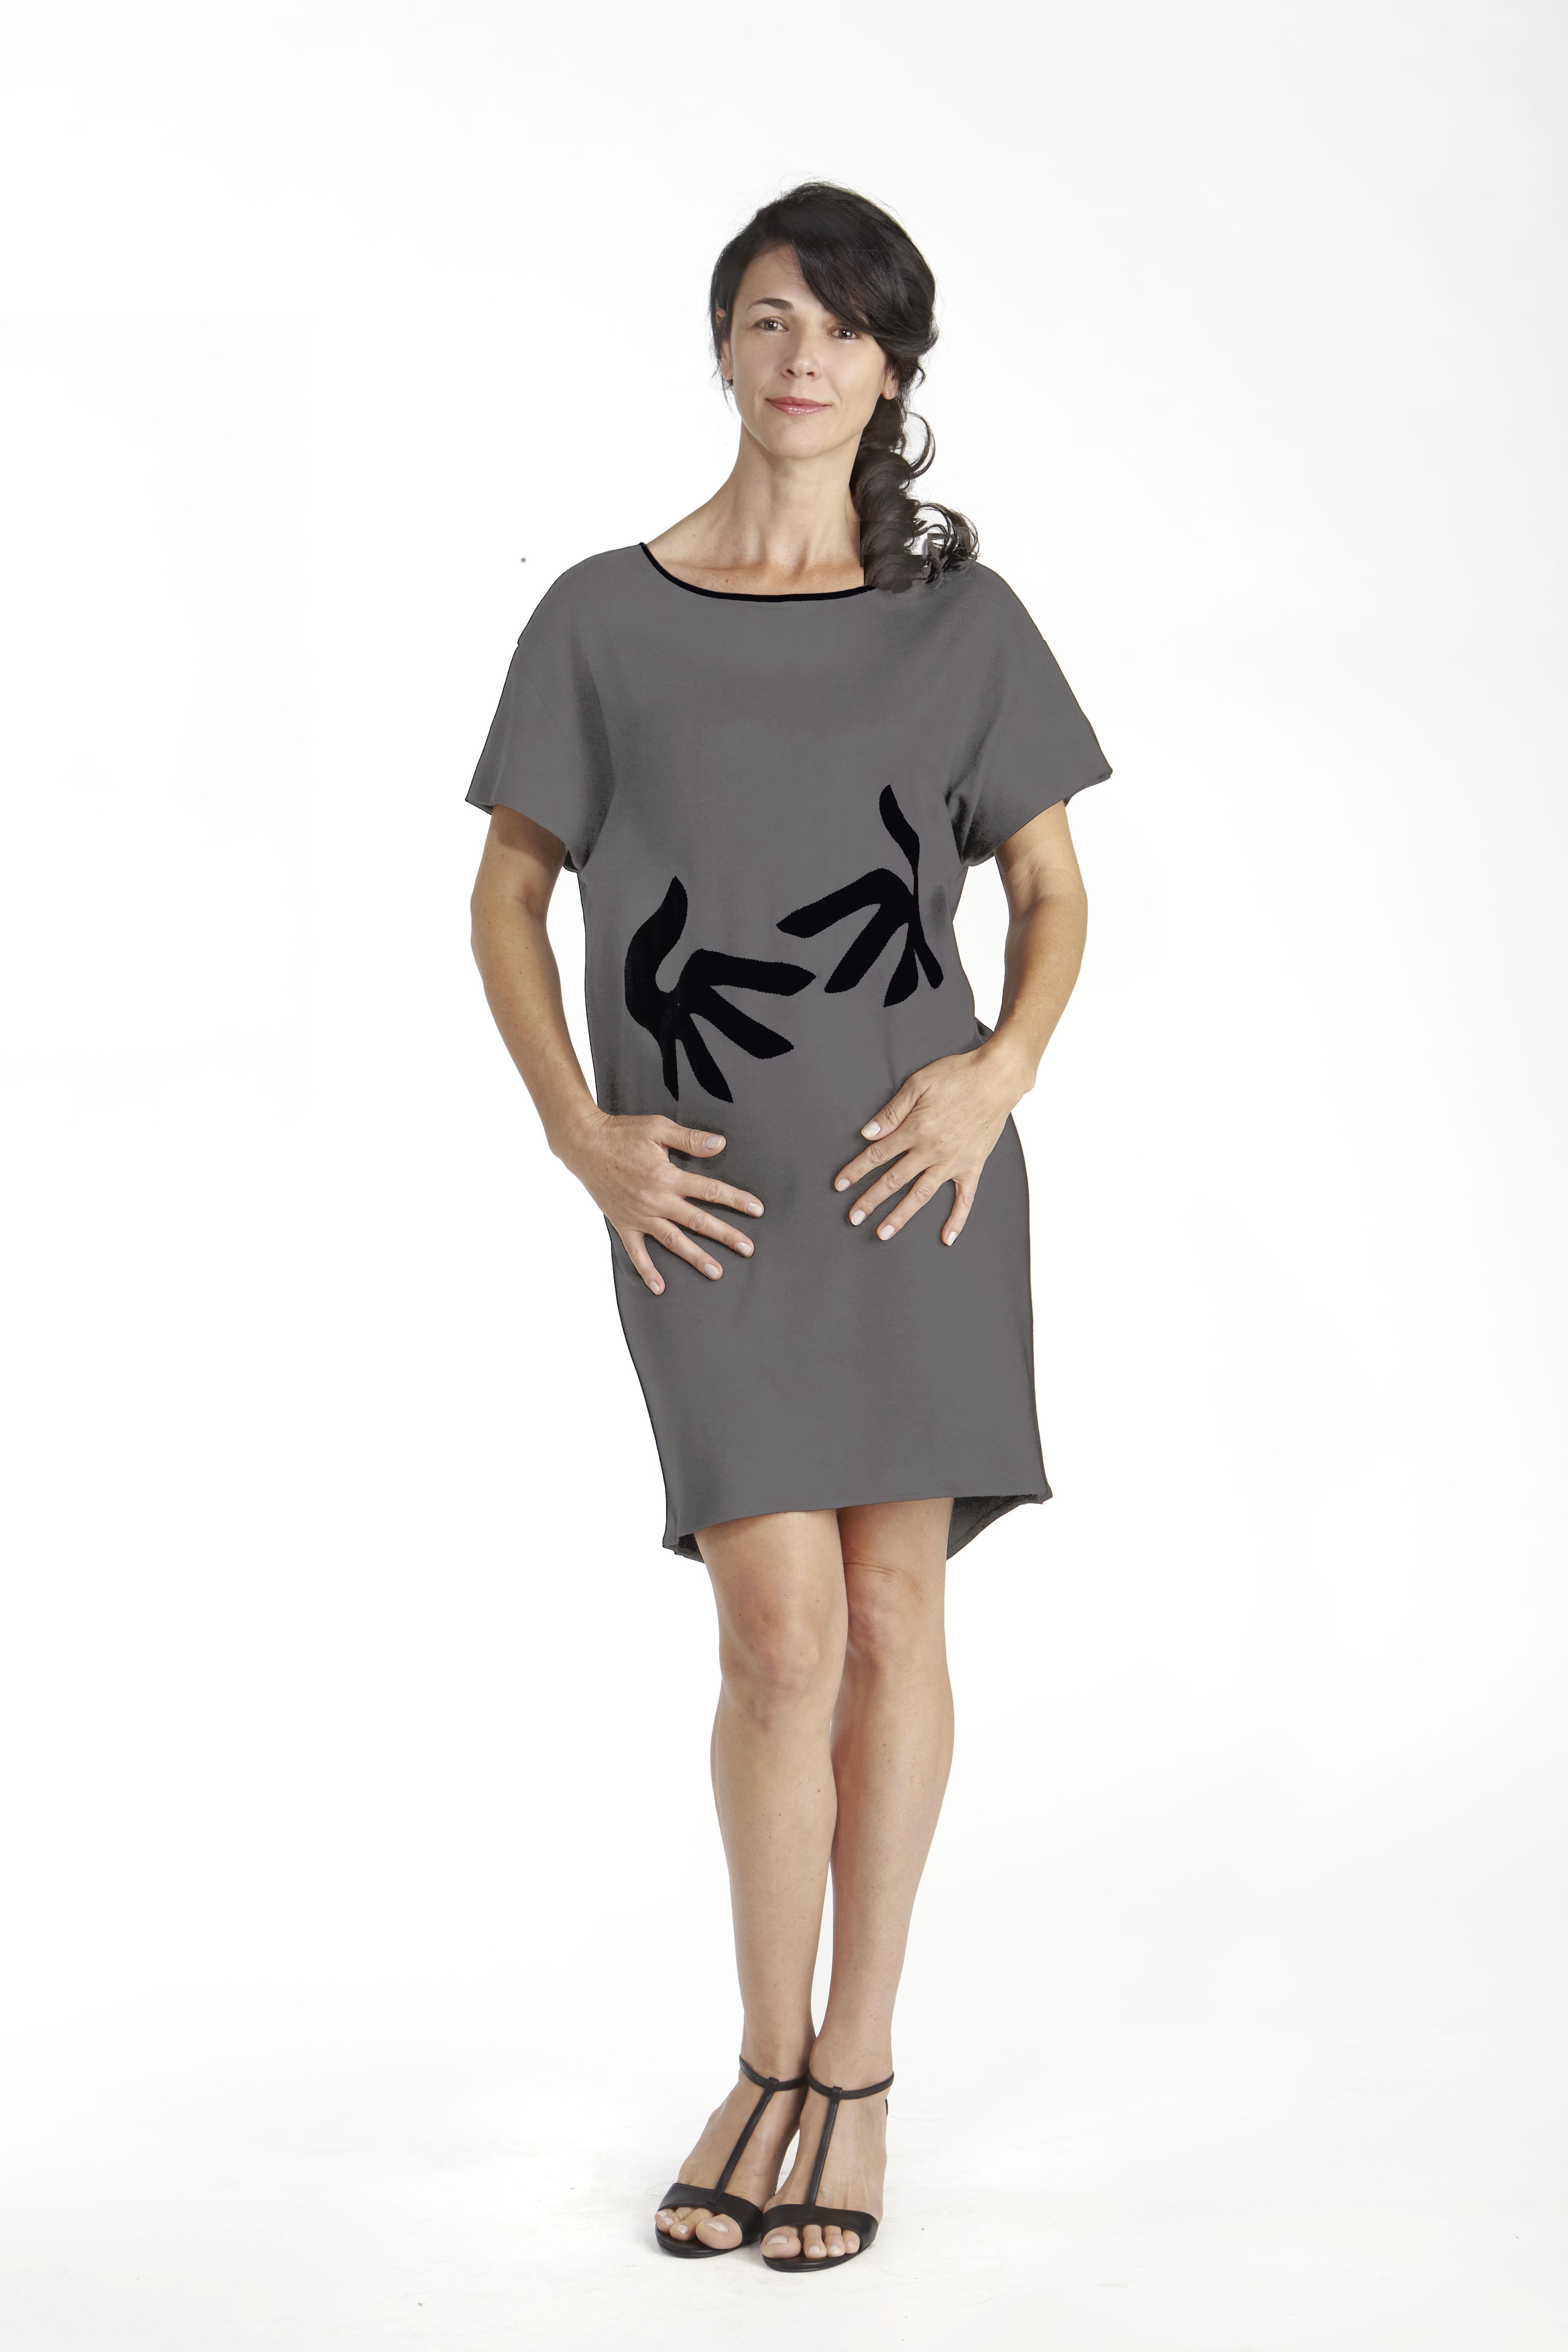 48b1f6c4bb65c Hug Short Sleeve Dress in Pima Cotton - B.e Quality, Responsible ...